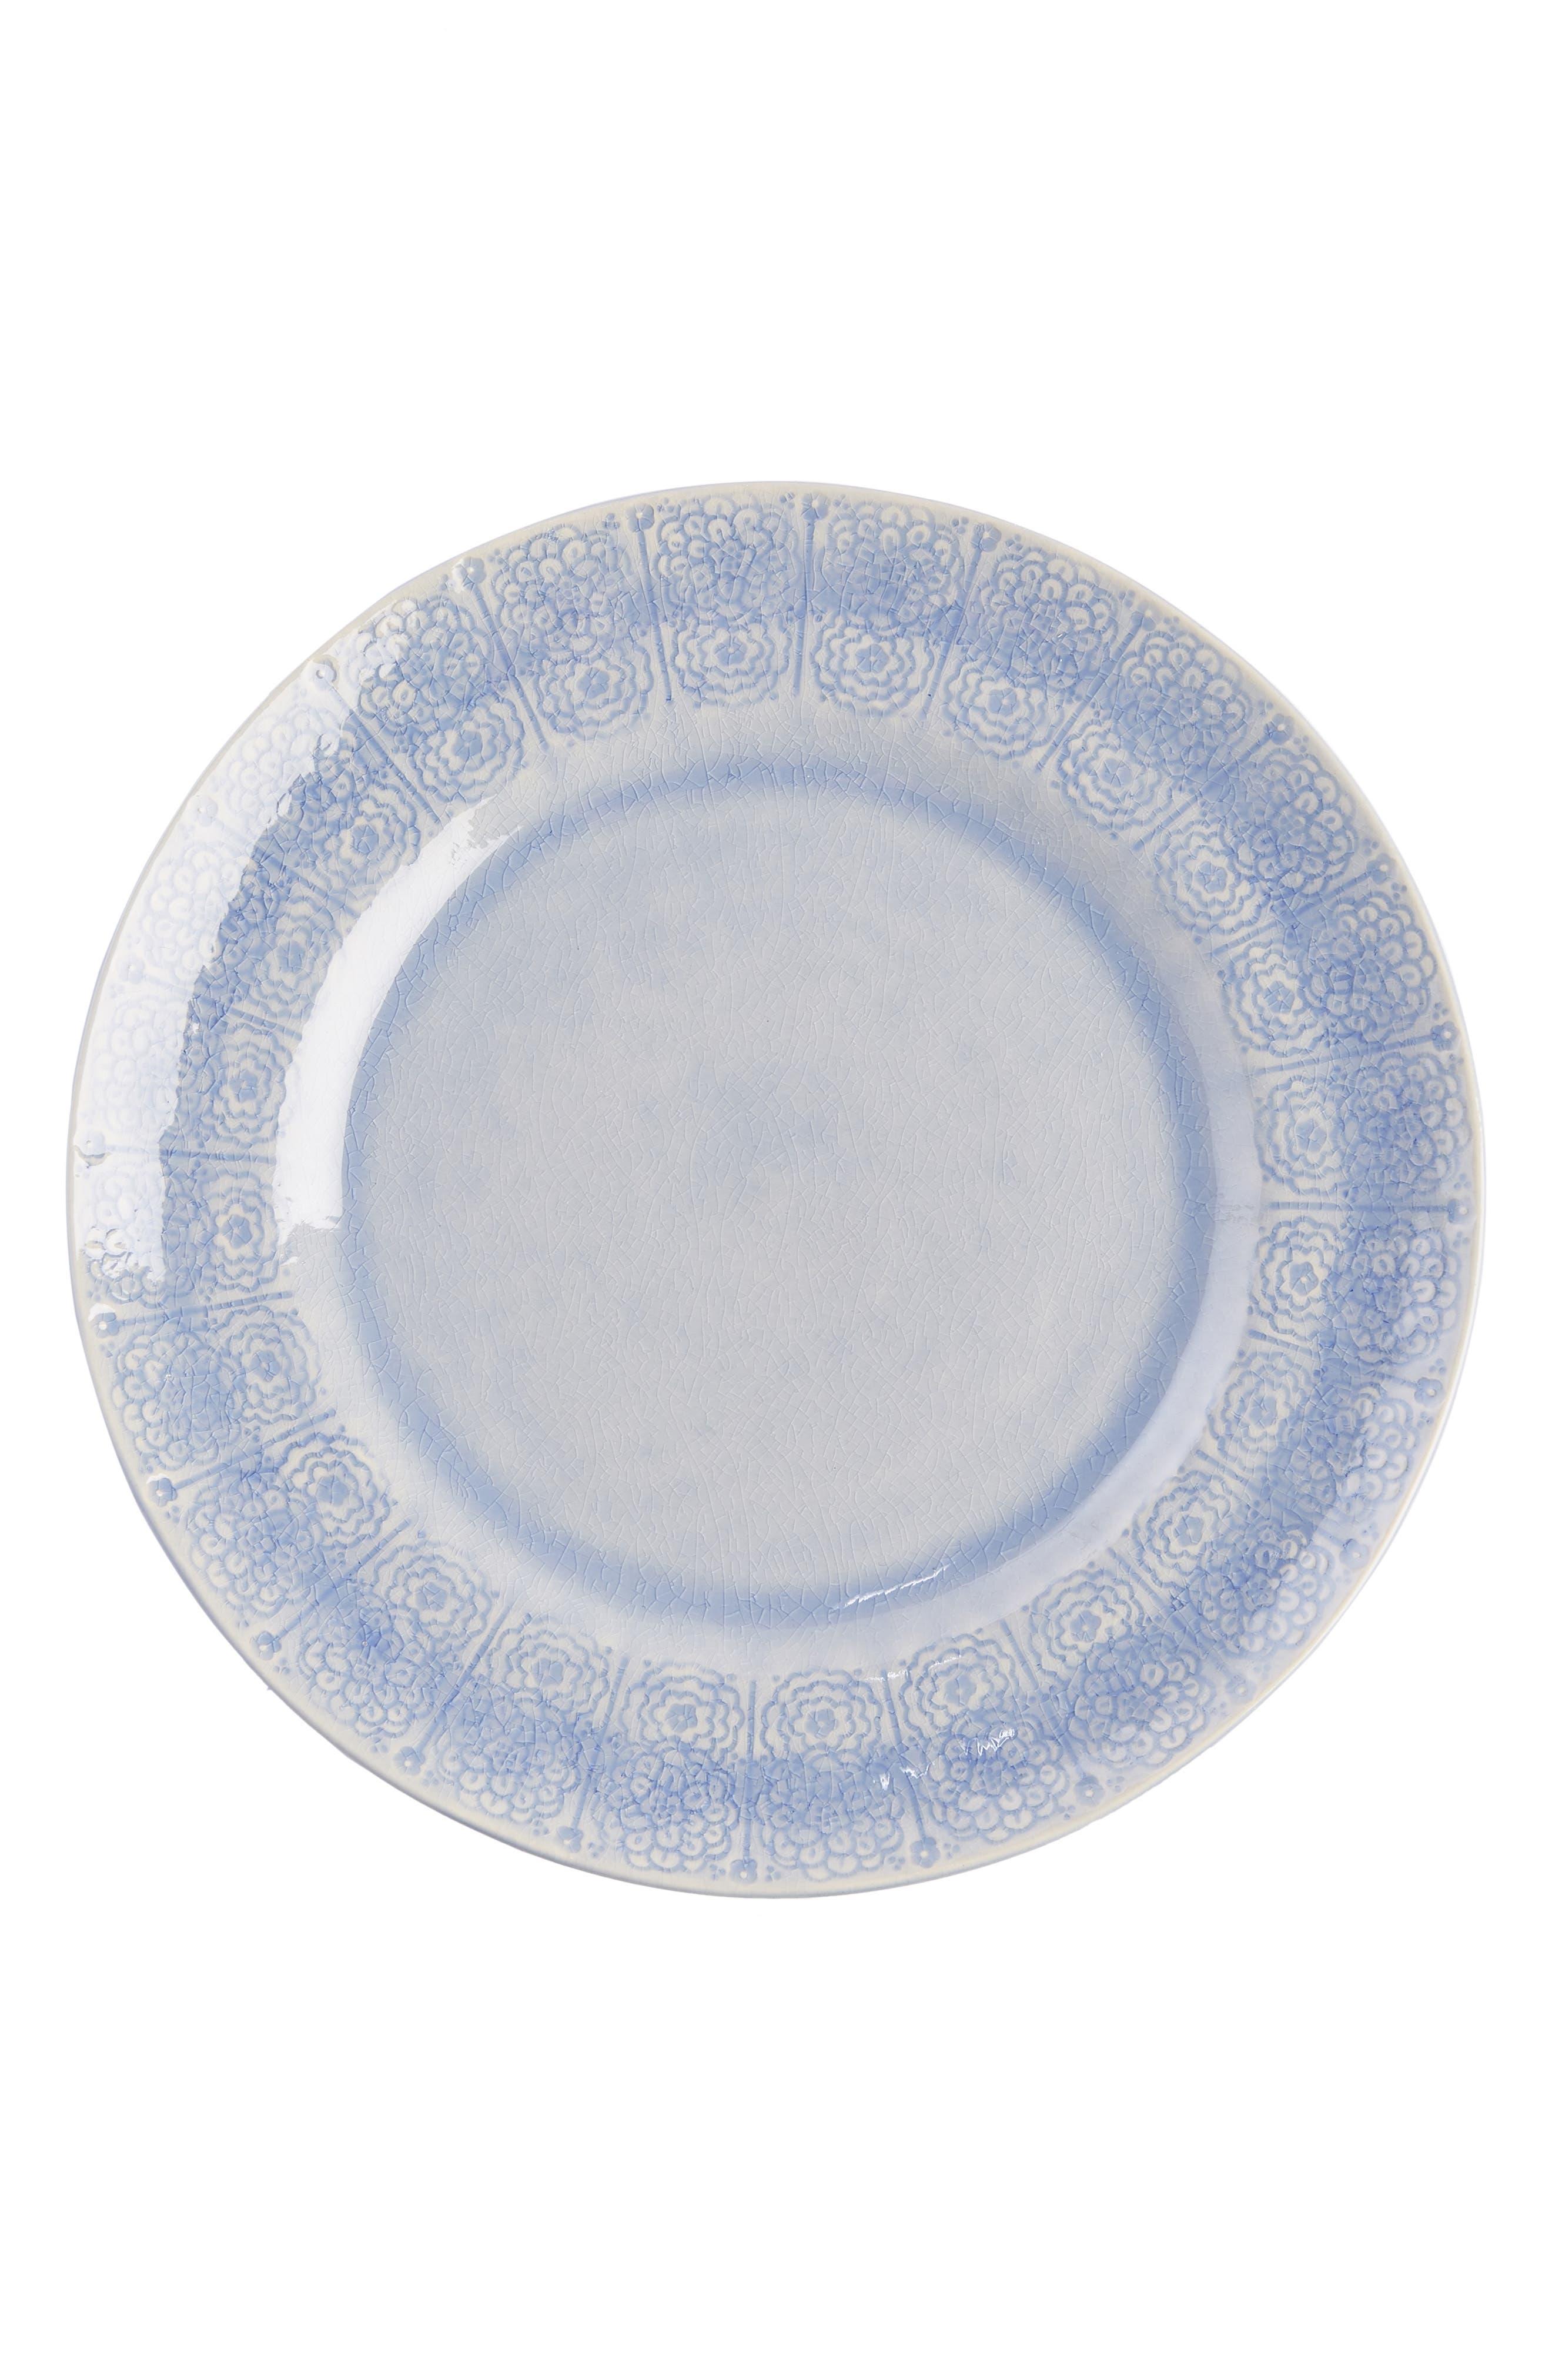 ANTHROPOLOGIE,                             Veru Dinner Plate,                             Alternate thumbnail 4, color,                             PERI